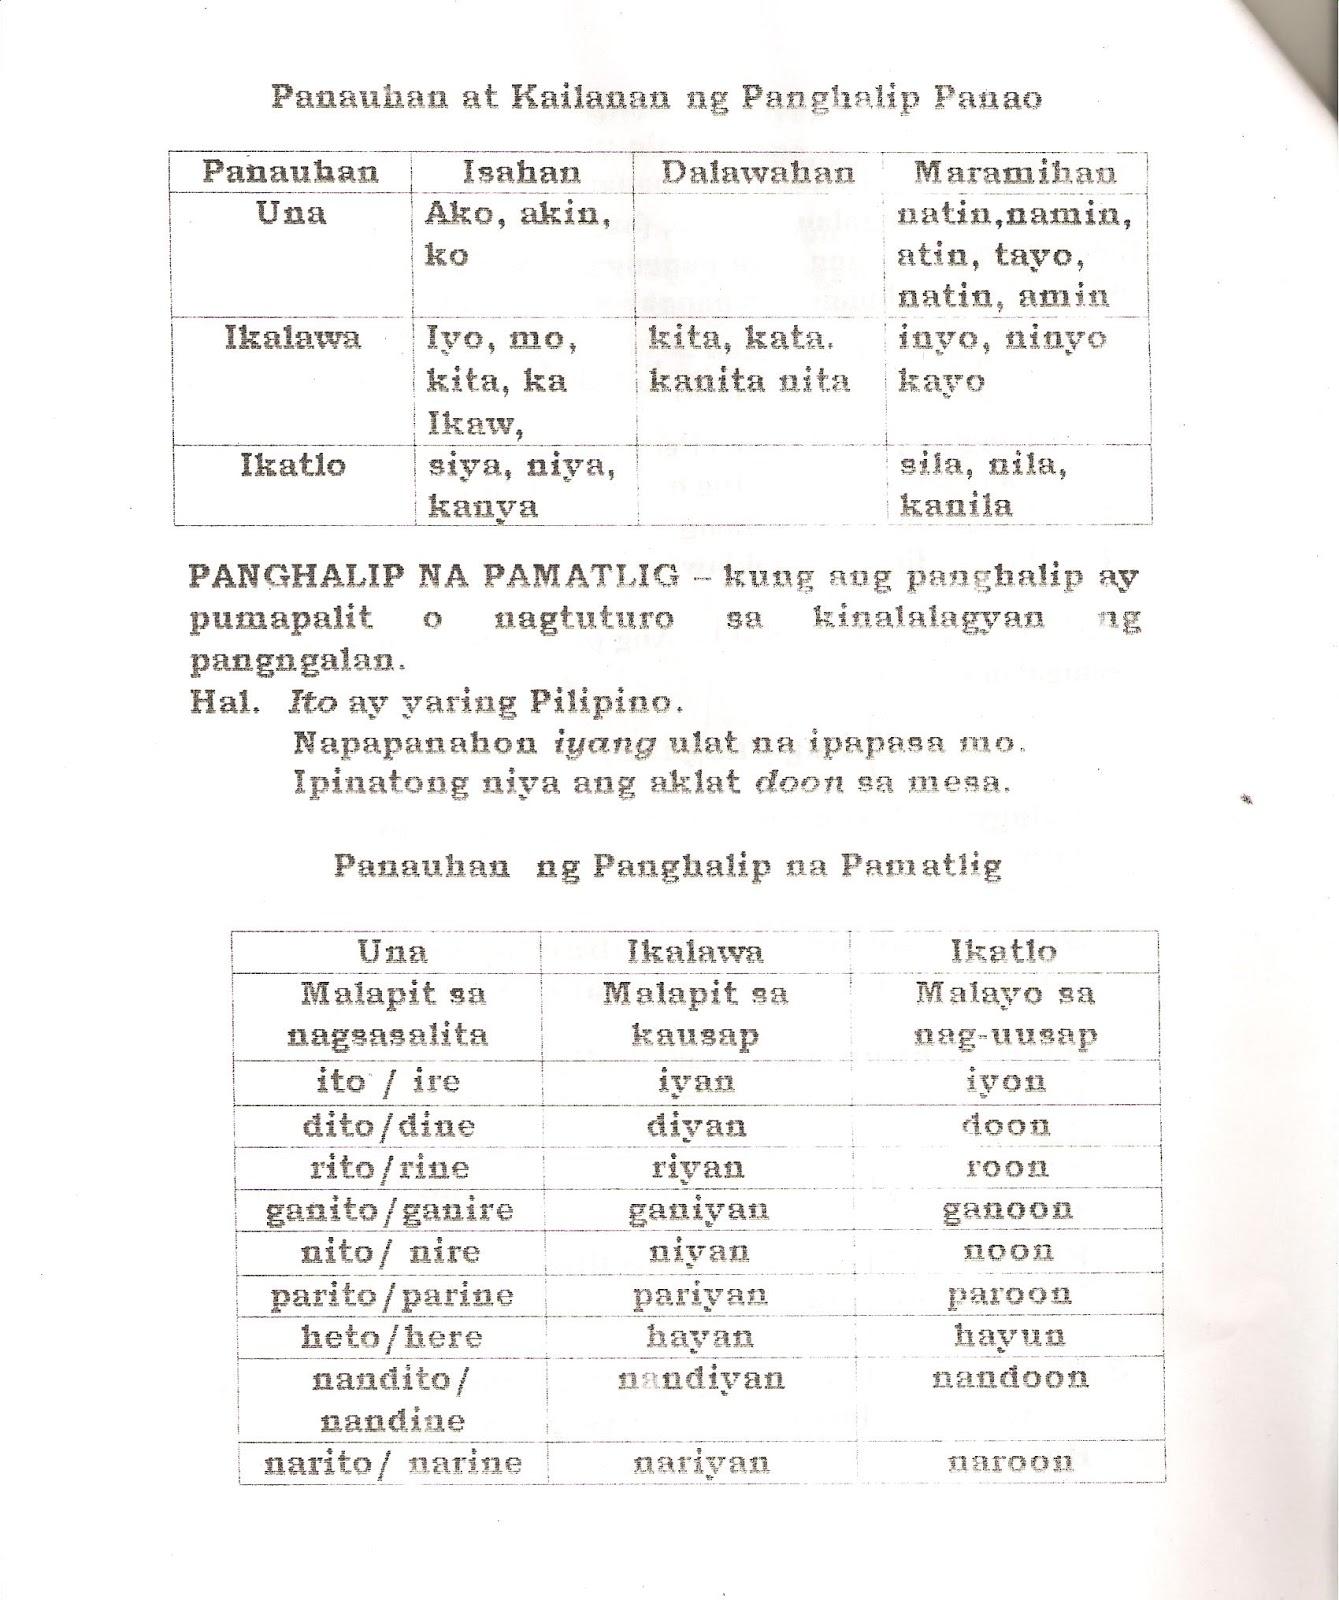 medium resolution of Pang Abay O Pang Uri Worksheet   Printable Worksheets and Activities for  Teachers